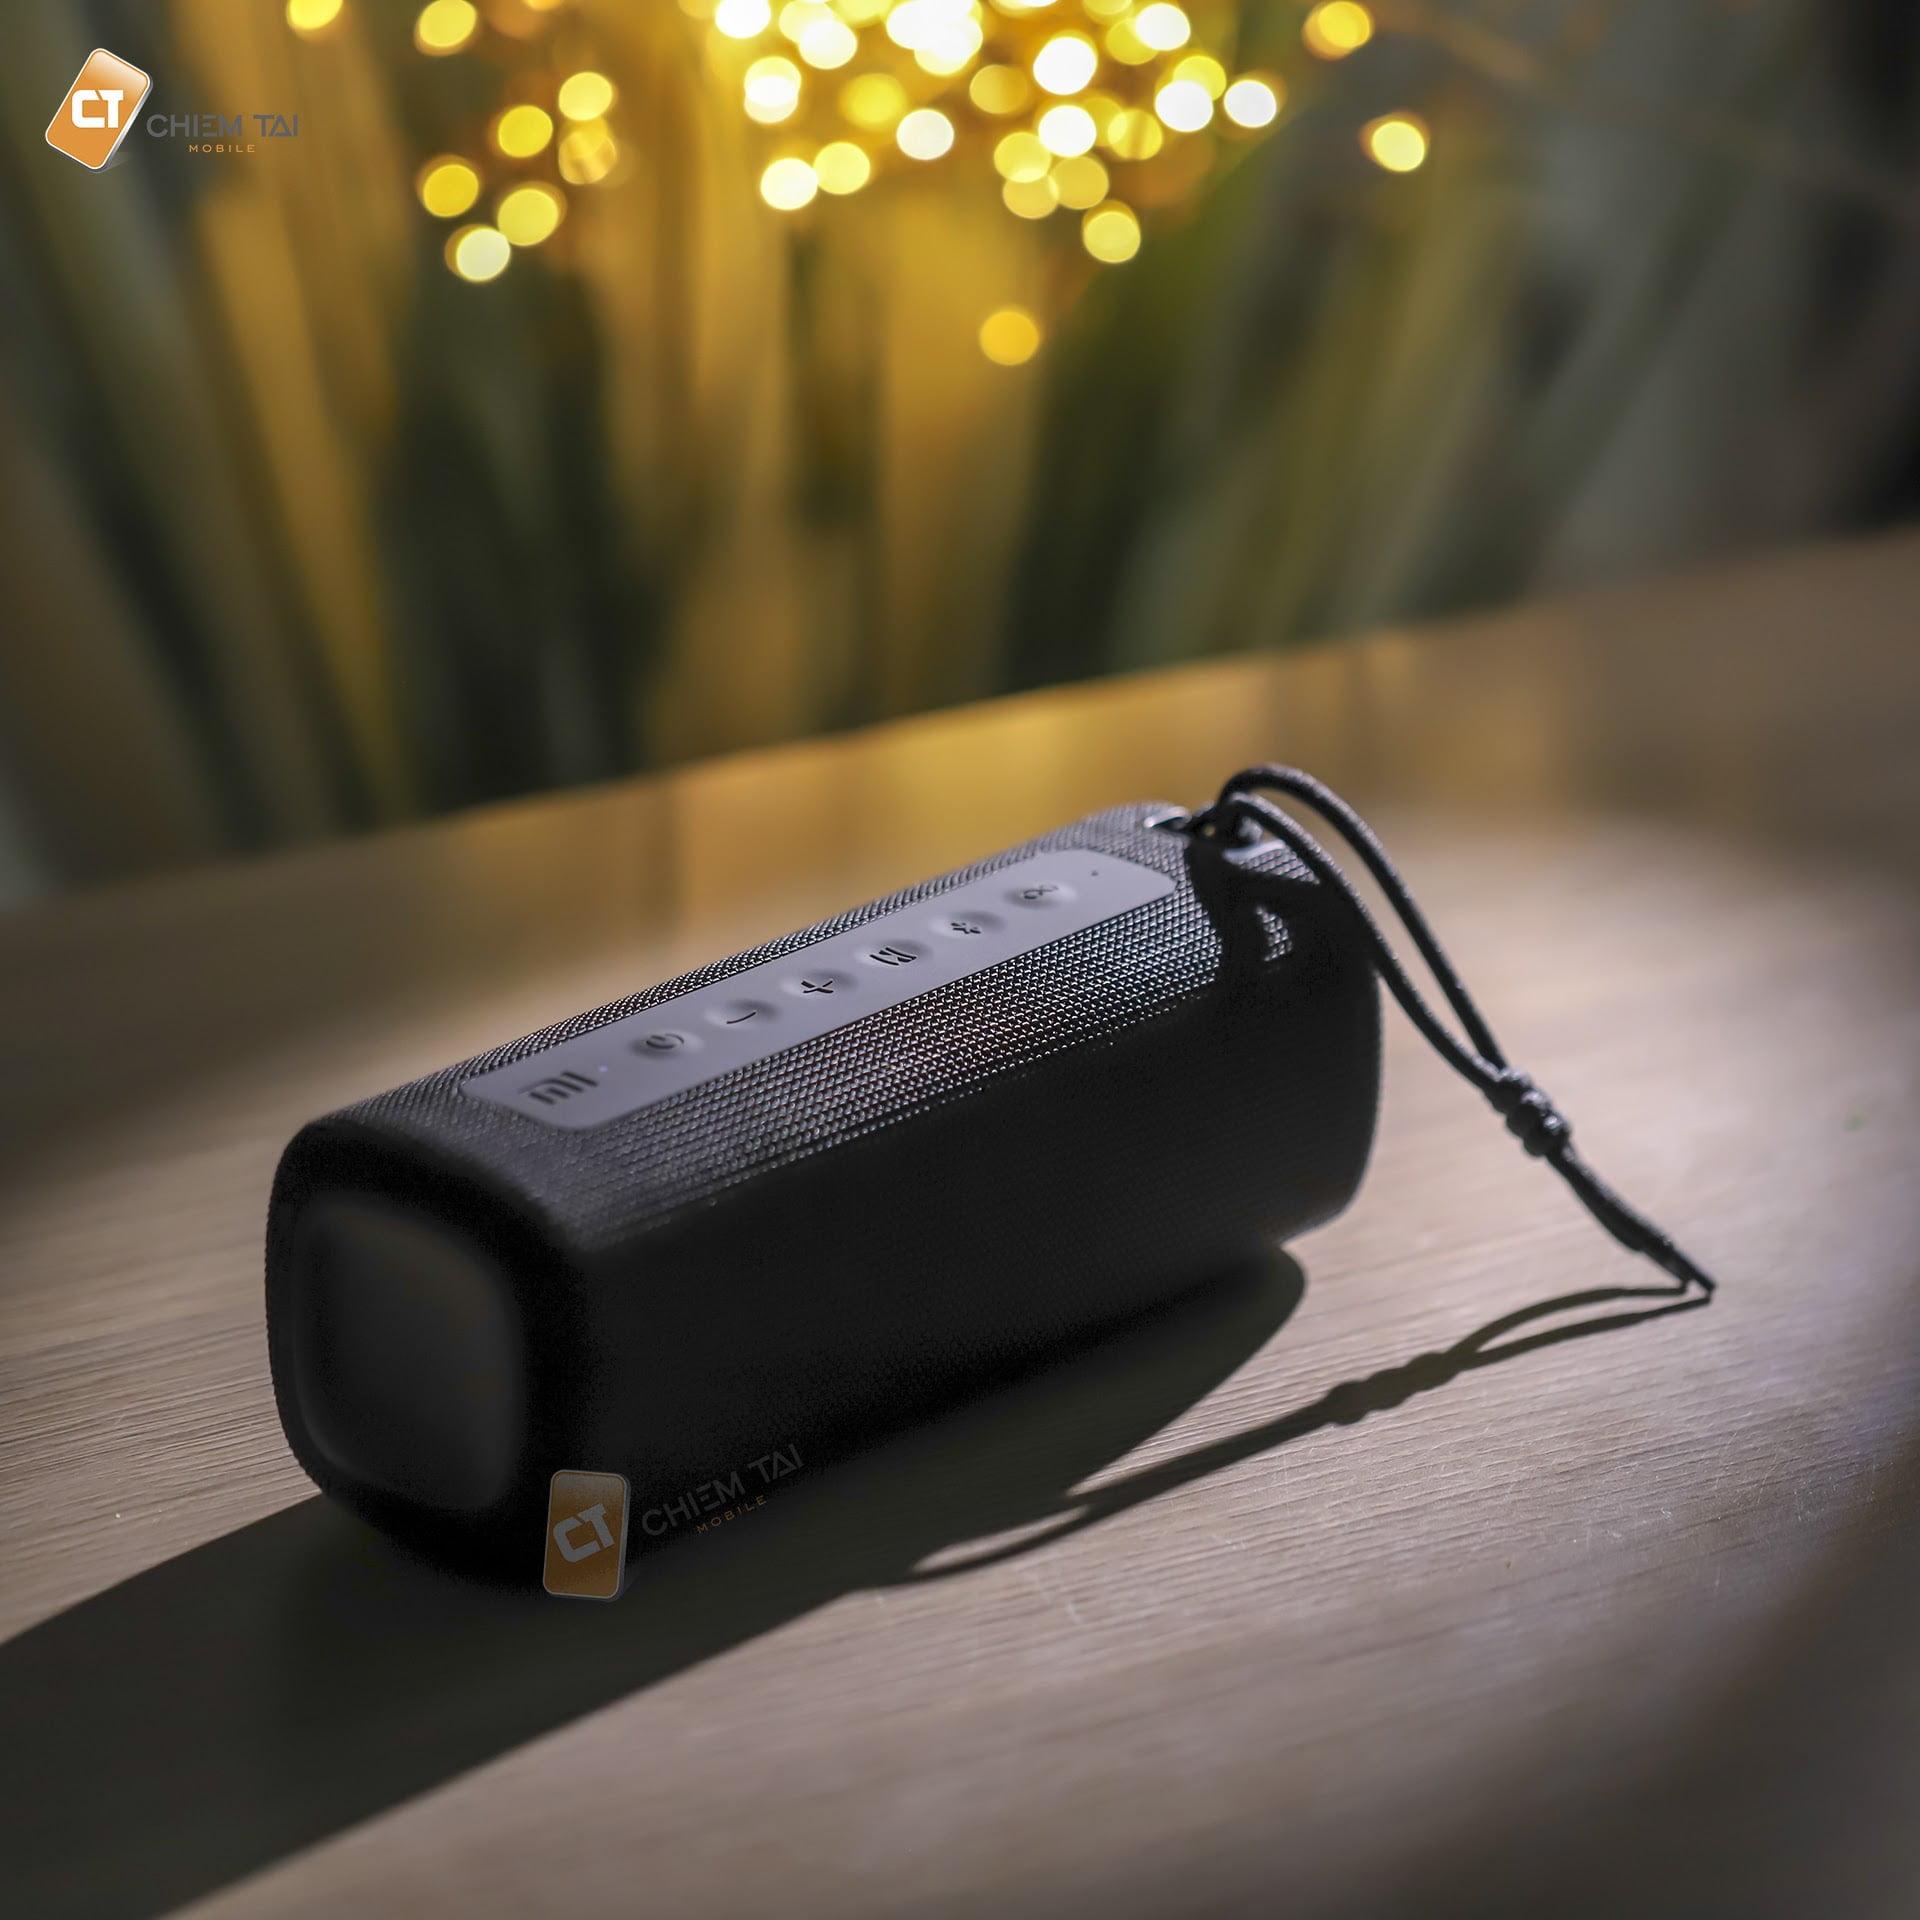 loa bluetooth outdoor xiaomi portable speaker 16w mdz 36 db 605d91e78c324